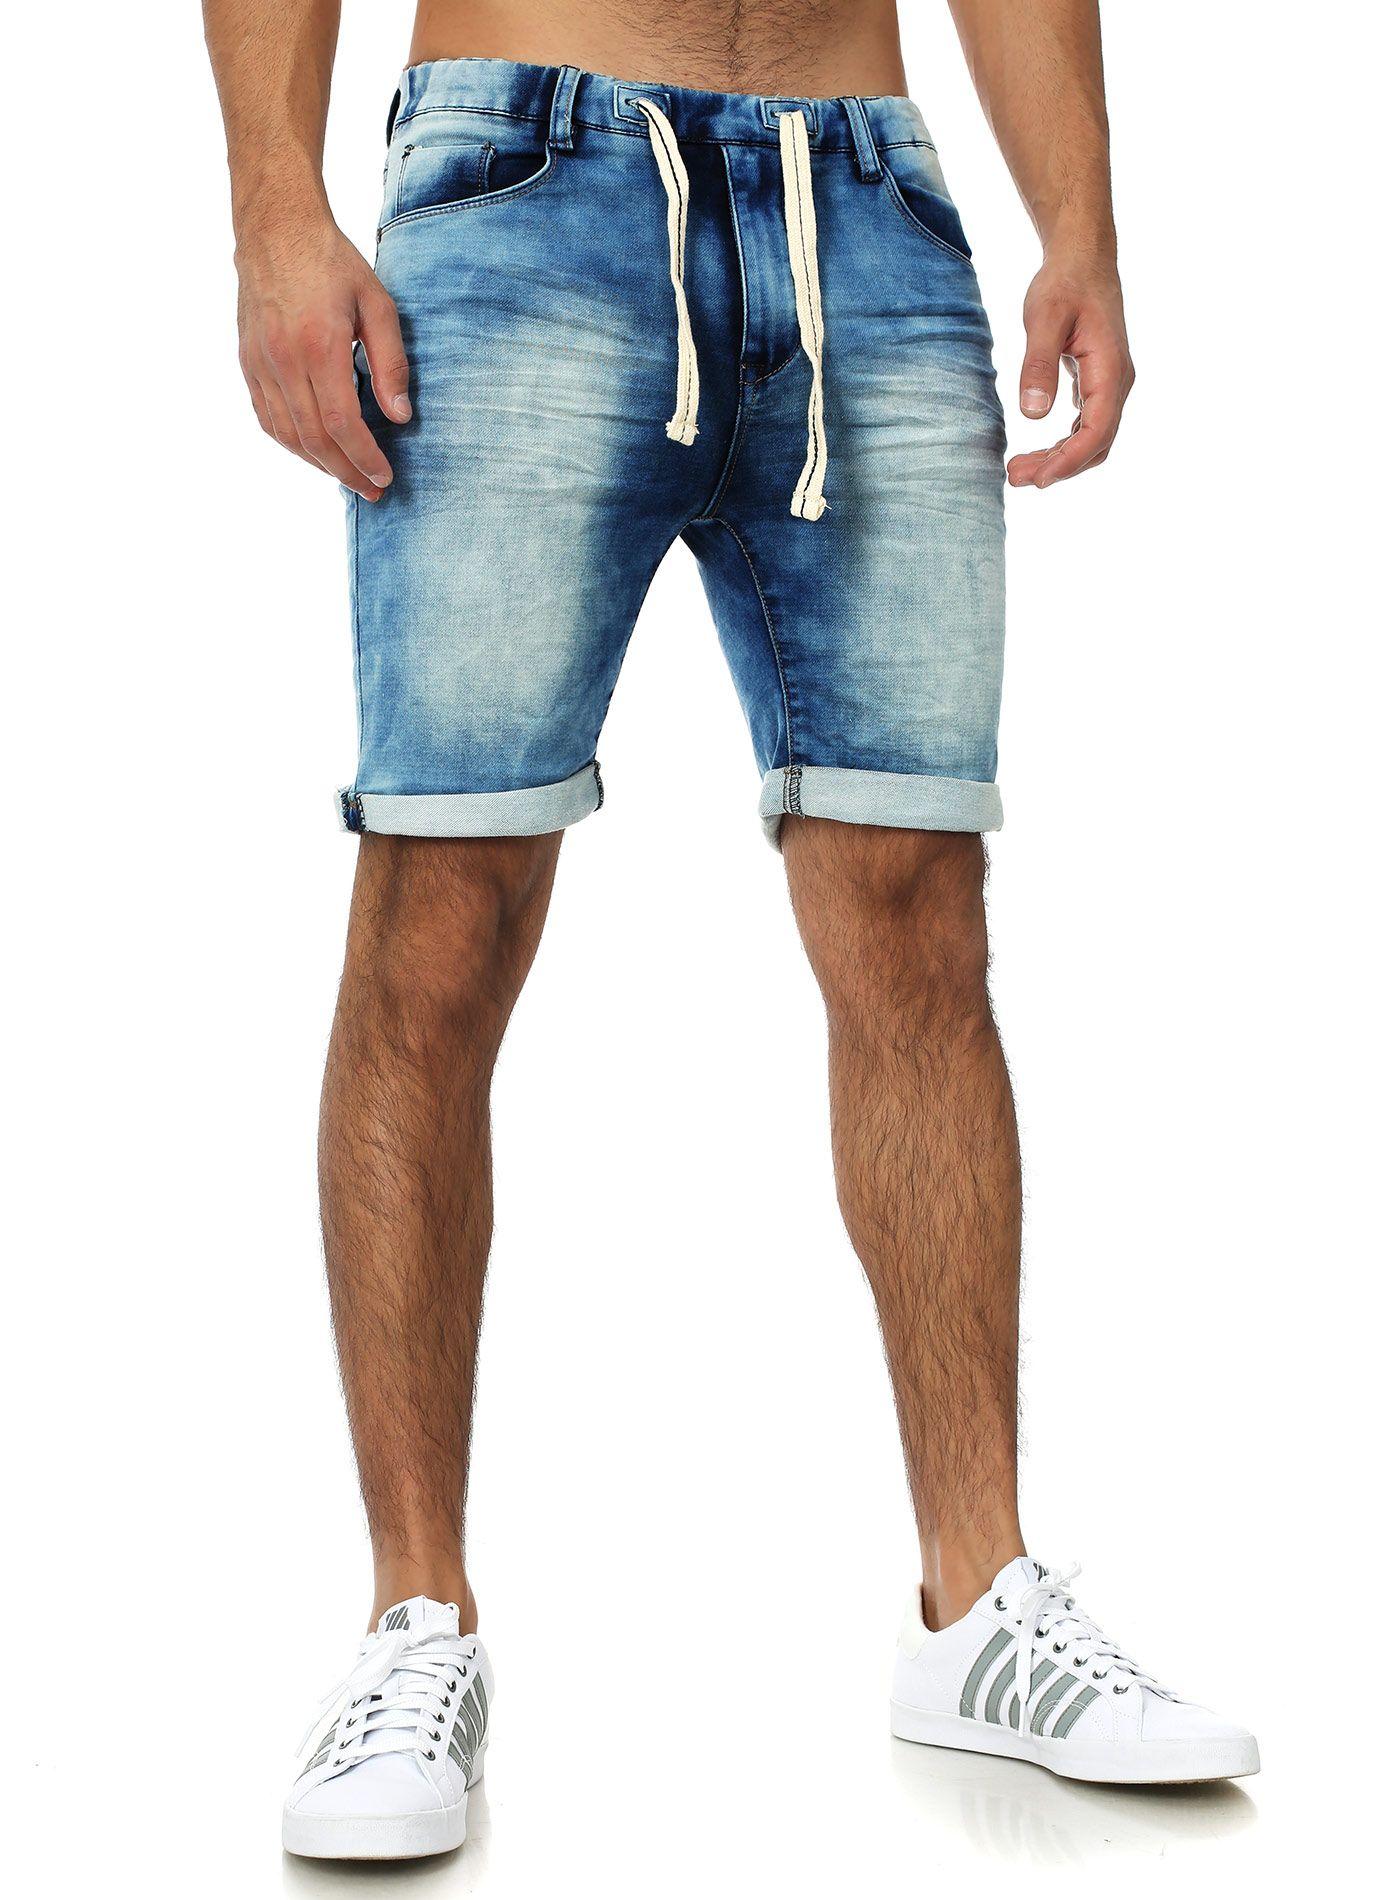 Sublevel Denim Jogger Shorts blue | MENS STYLE | Pinterest